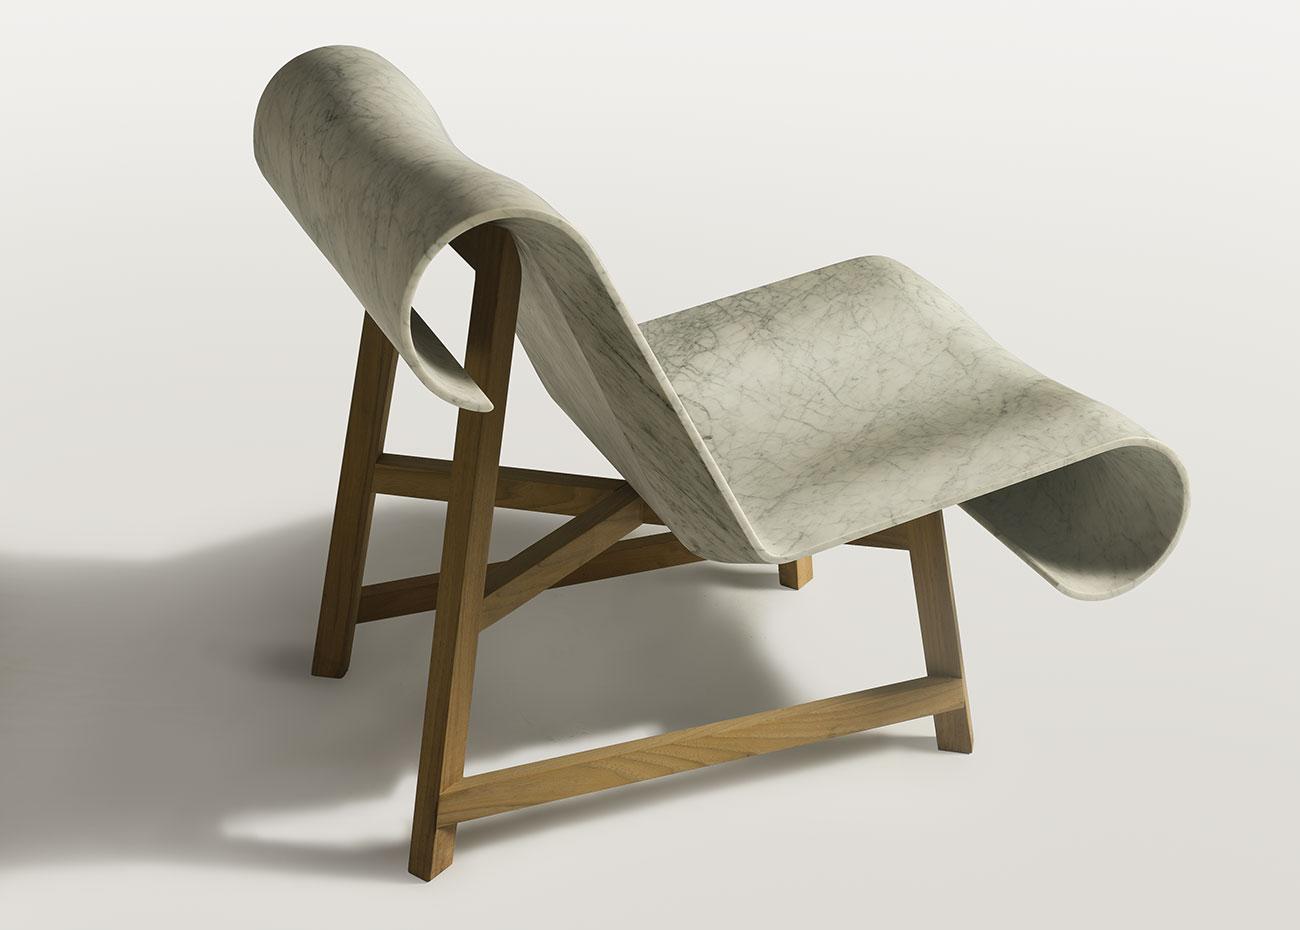 curl-stefano-gritti-sofia-rollo-mgm-la-marmoteca-sedia-marmo